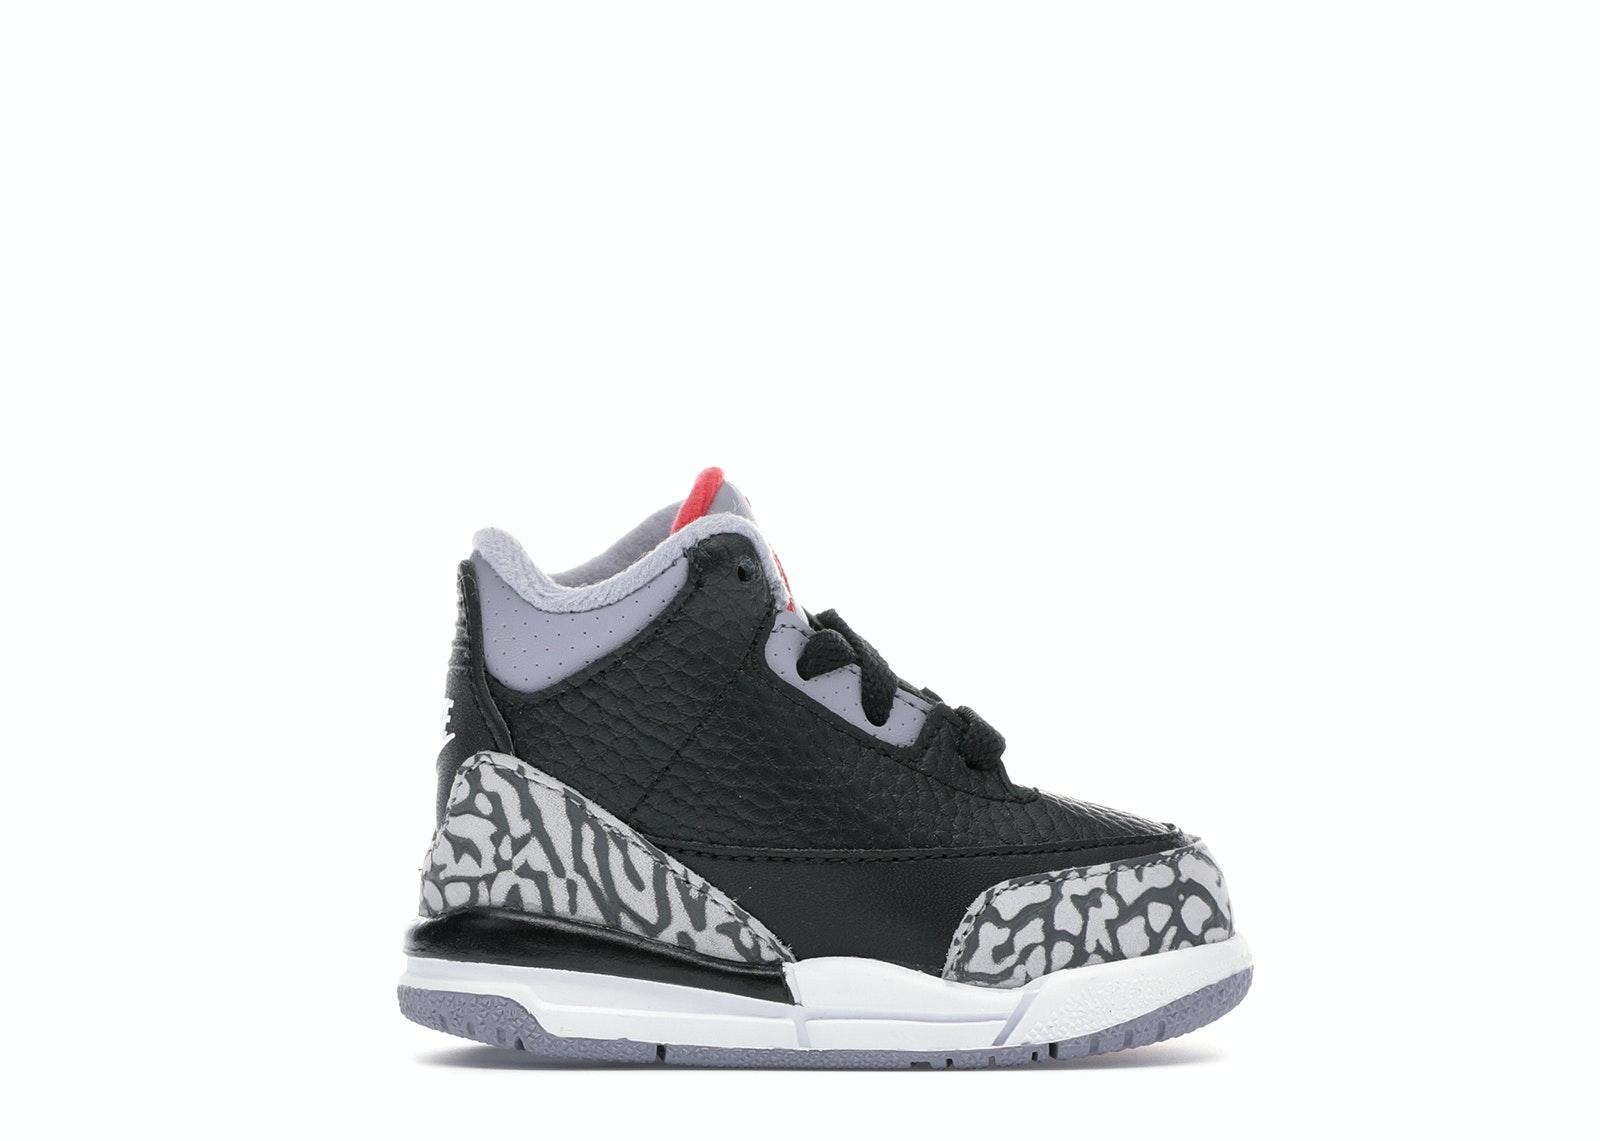 Jordan 3 Retro Black Cement 2018 (TD)